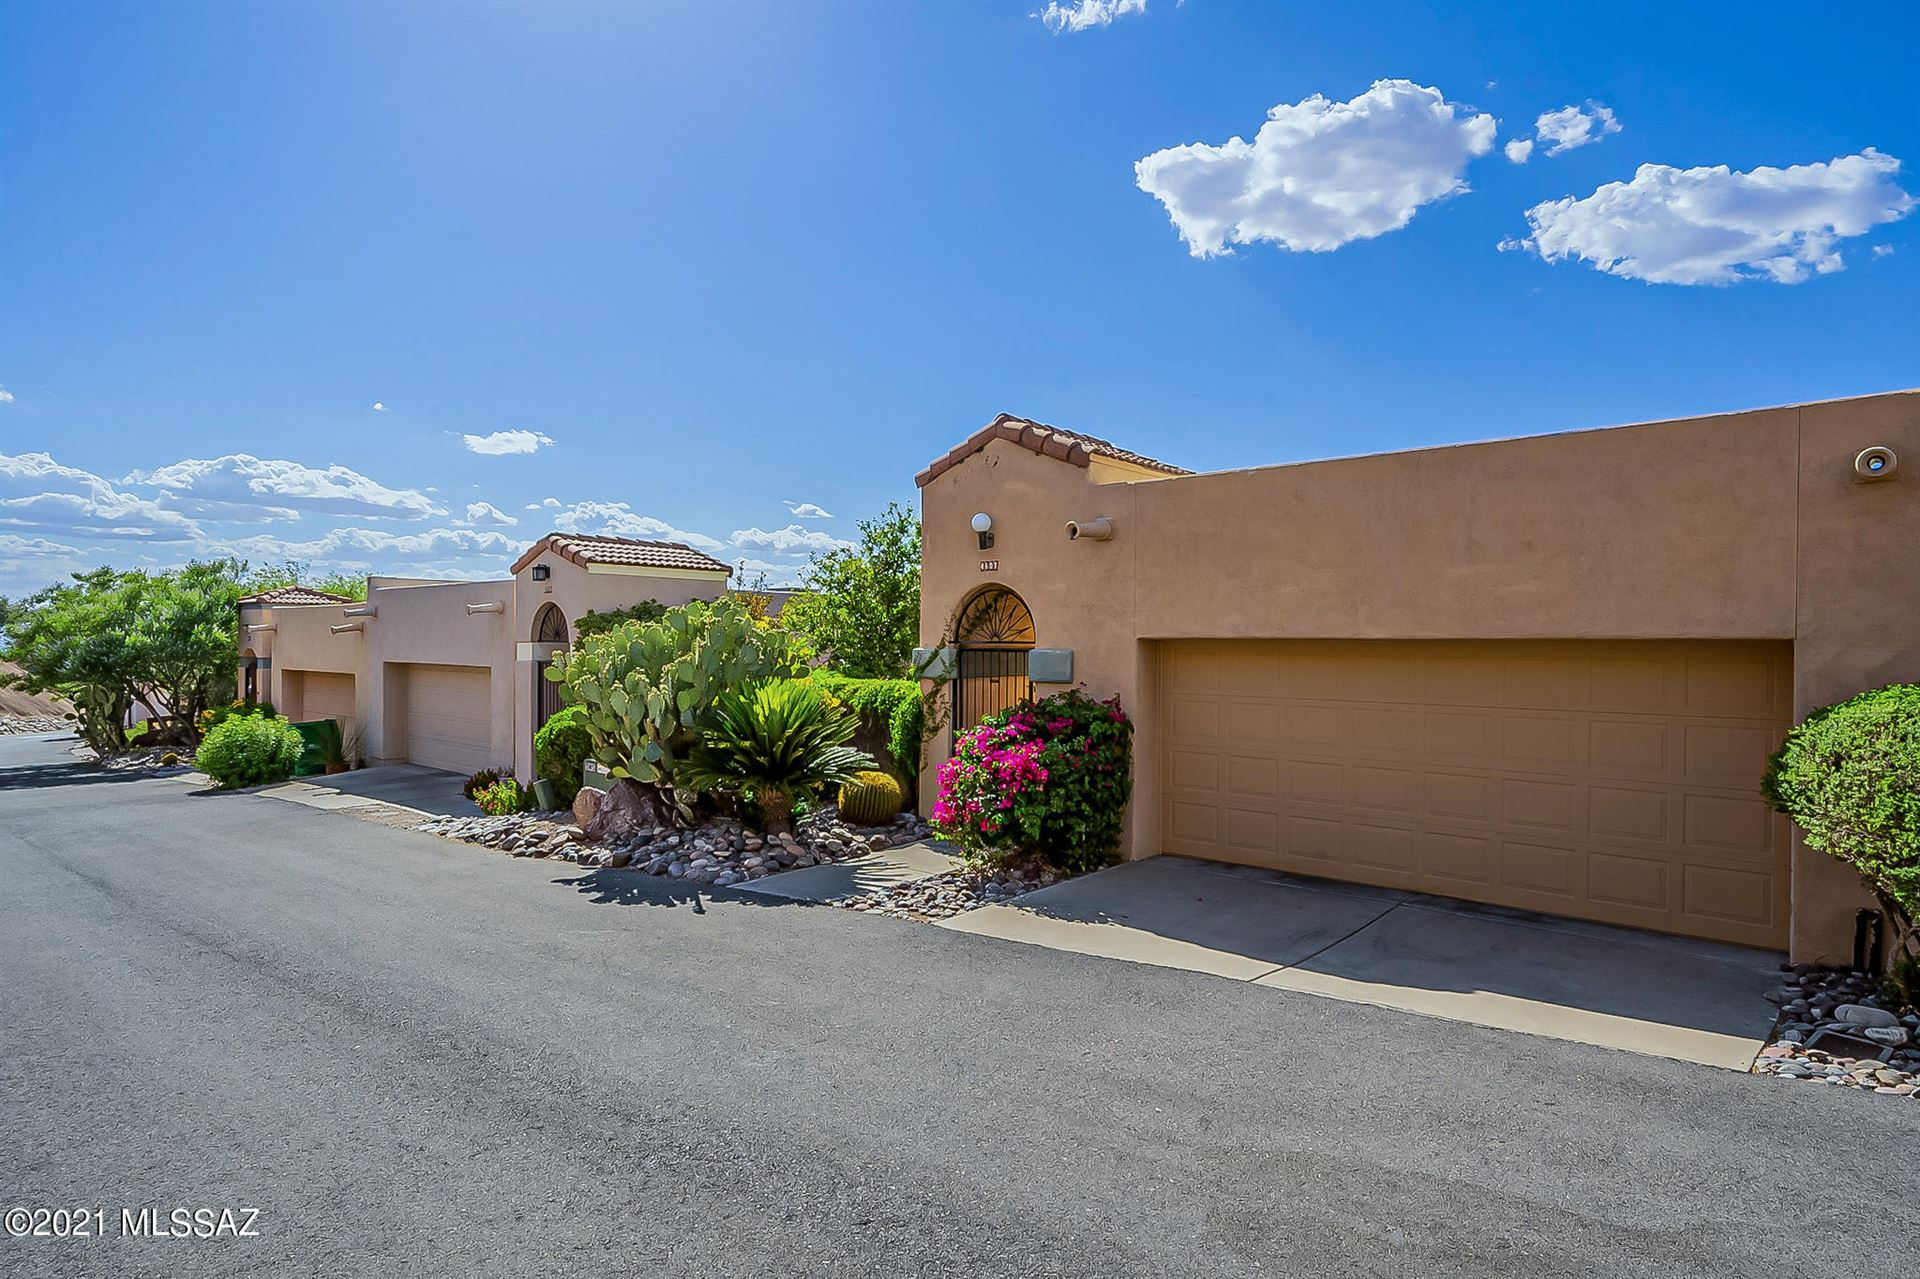 4607 E Shastan Way, Tucson, AZ 85718 - MLS#: 22113148